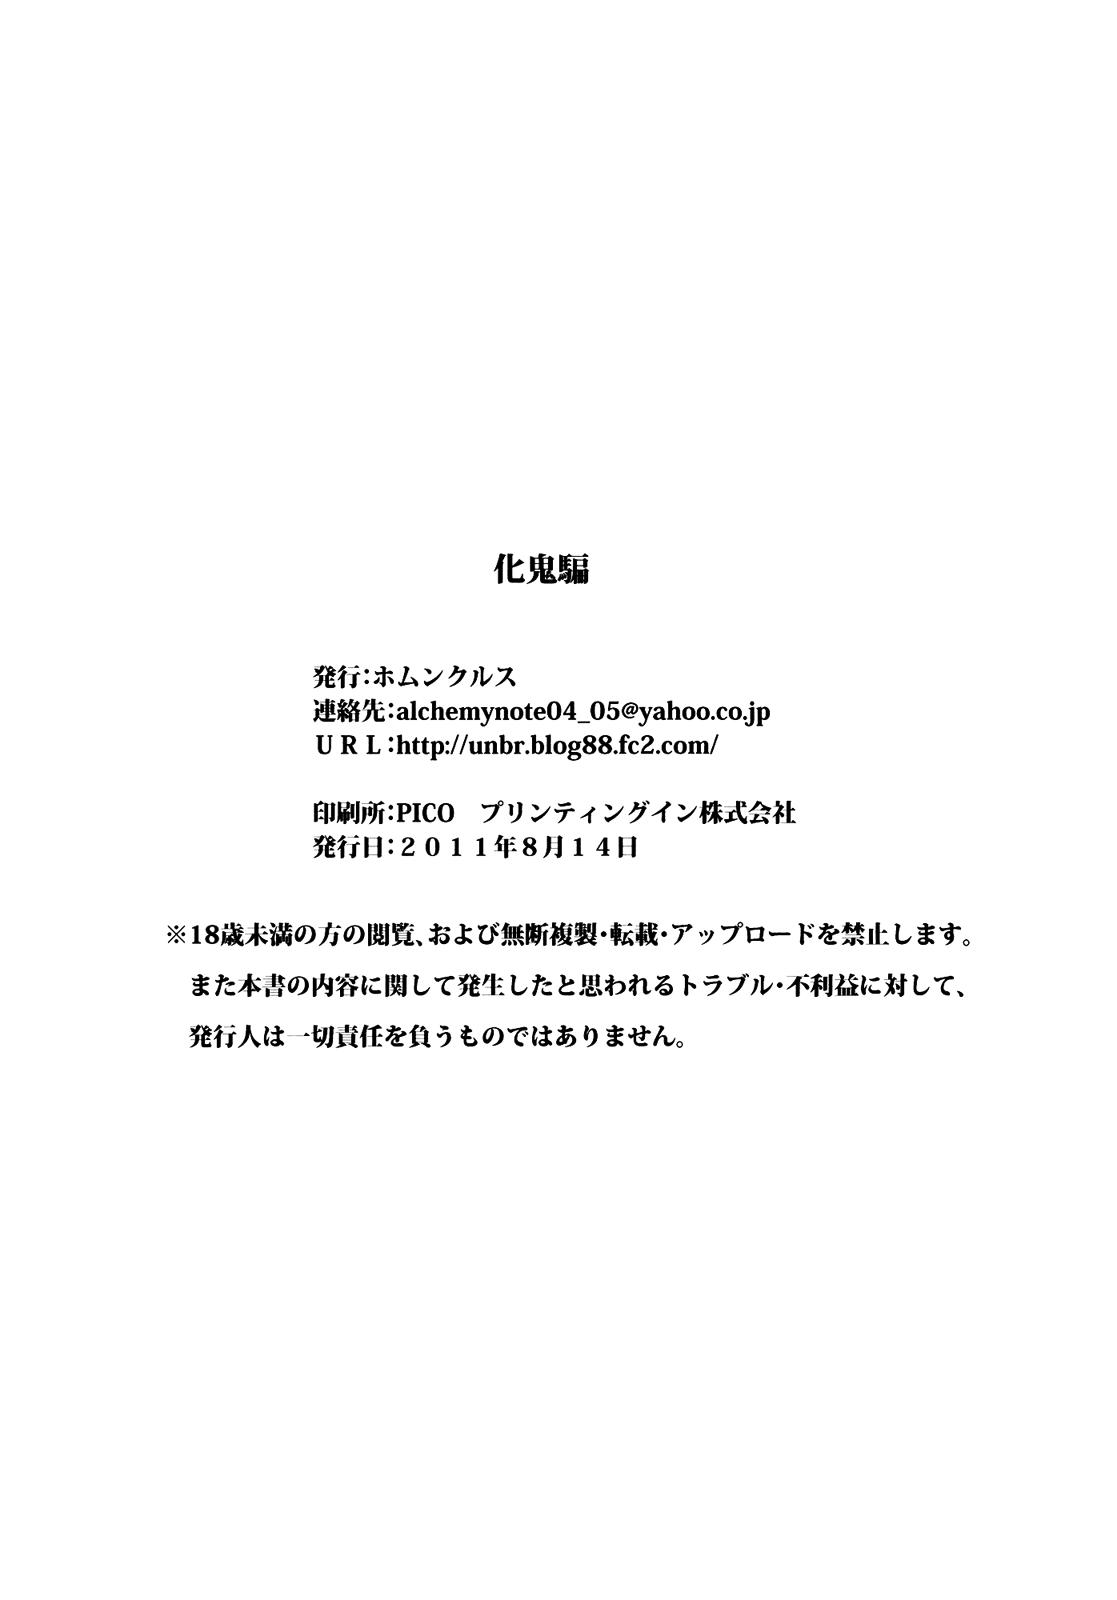 Bakeonigatari 24